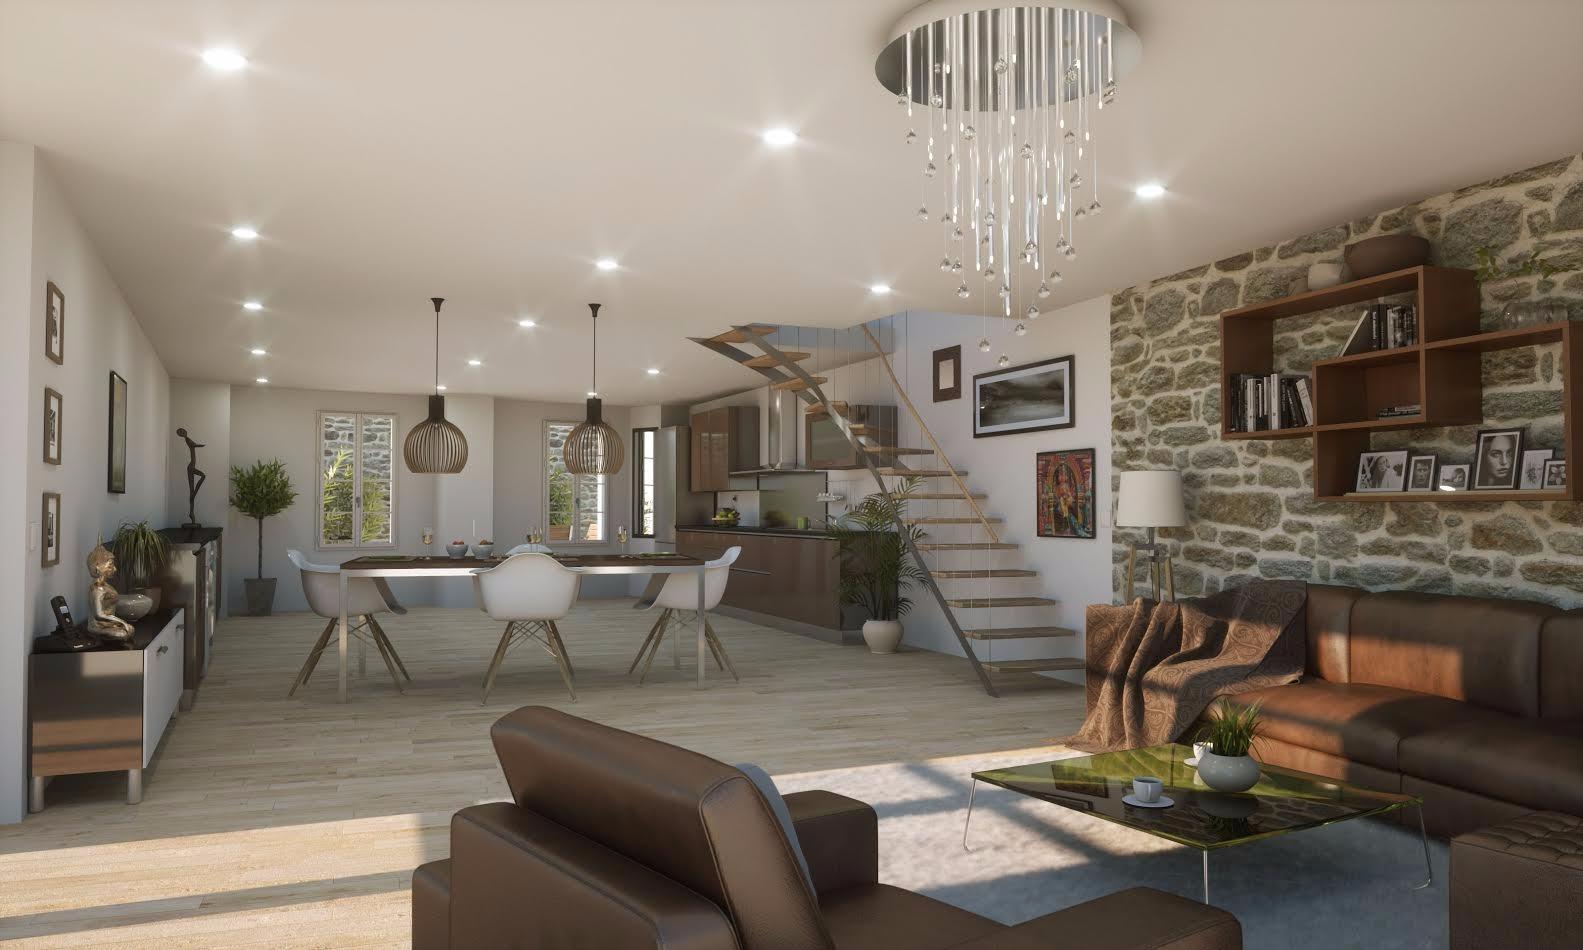 achat traditionnelle vannes en morbihan 56000 vannes hyper centre ville. Black Bedroom Furniture Sets. Home Design Ideas